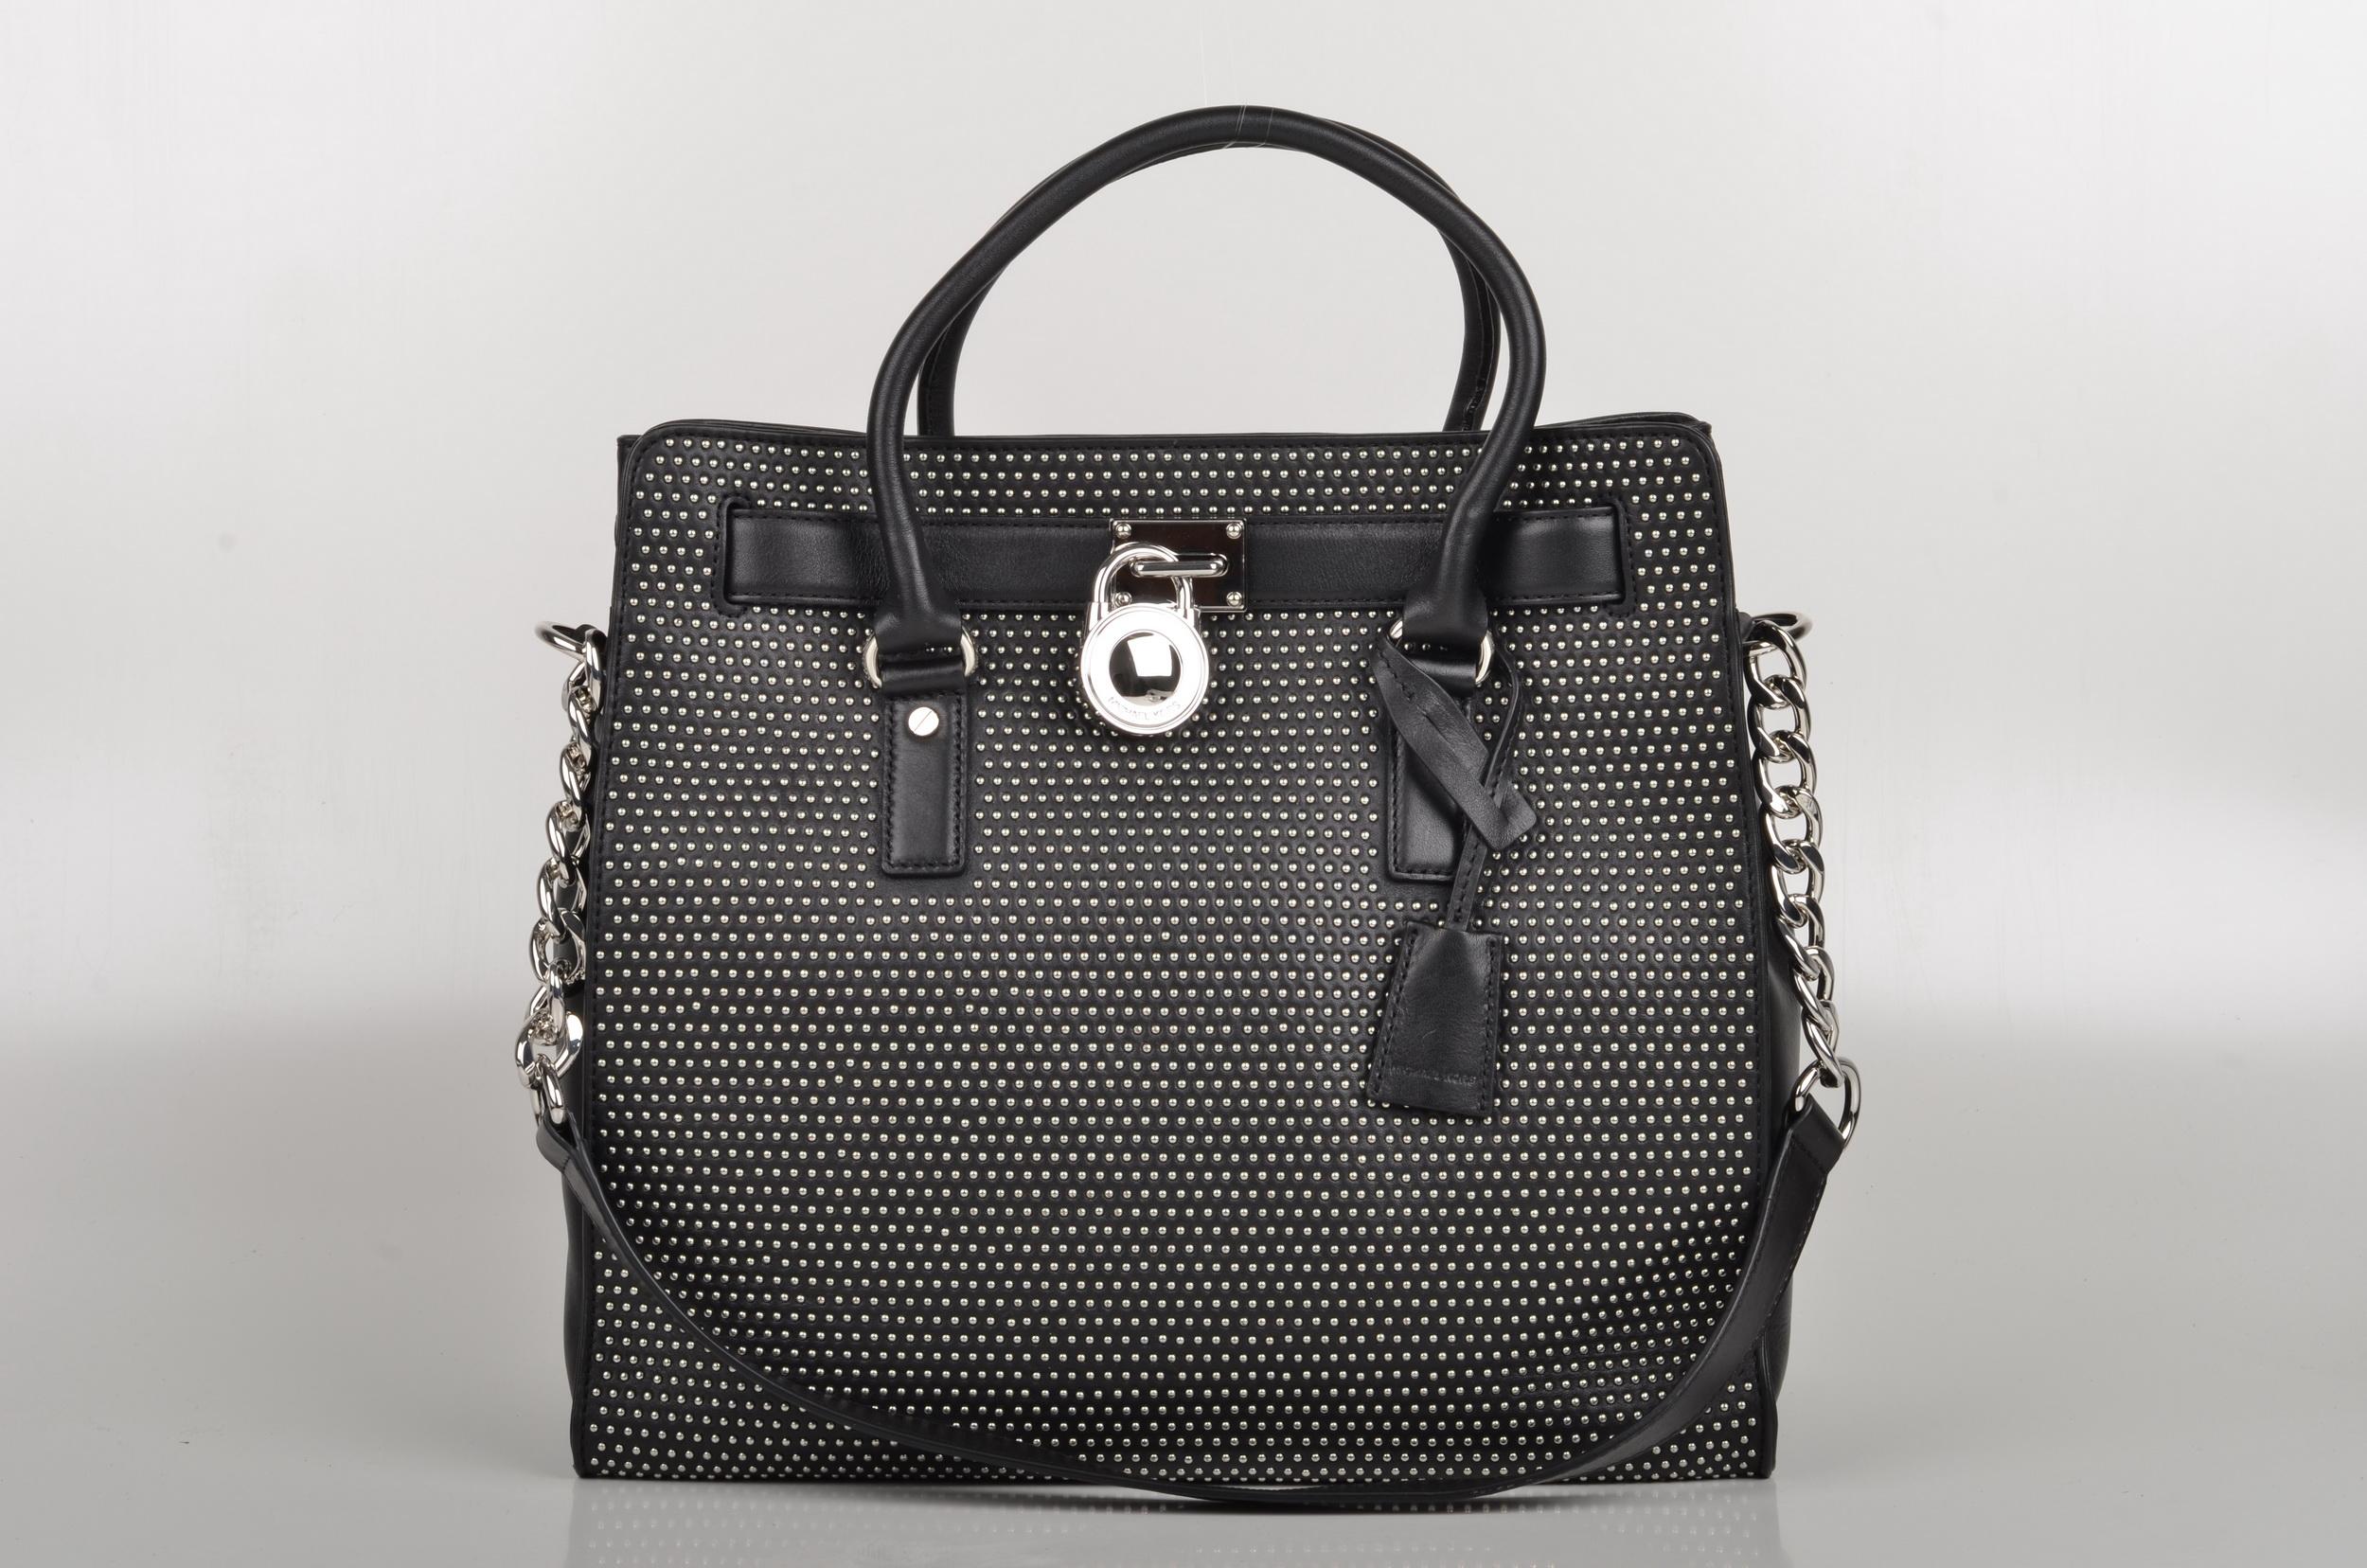 michael kors hamilton microstud handbag handbags 2018. Black Bedroom Furniture Sets. Home Design Ideas